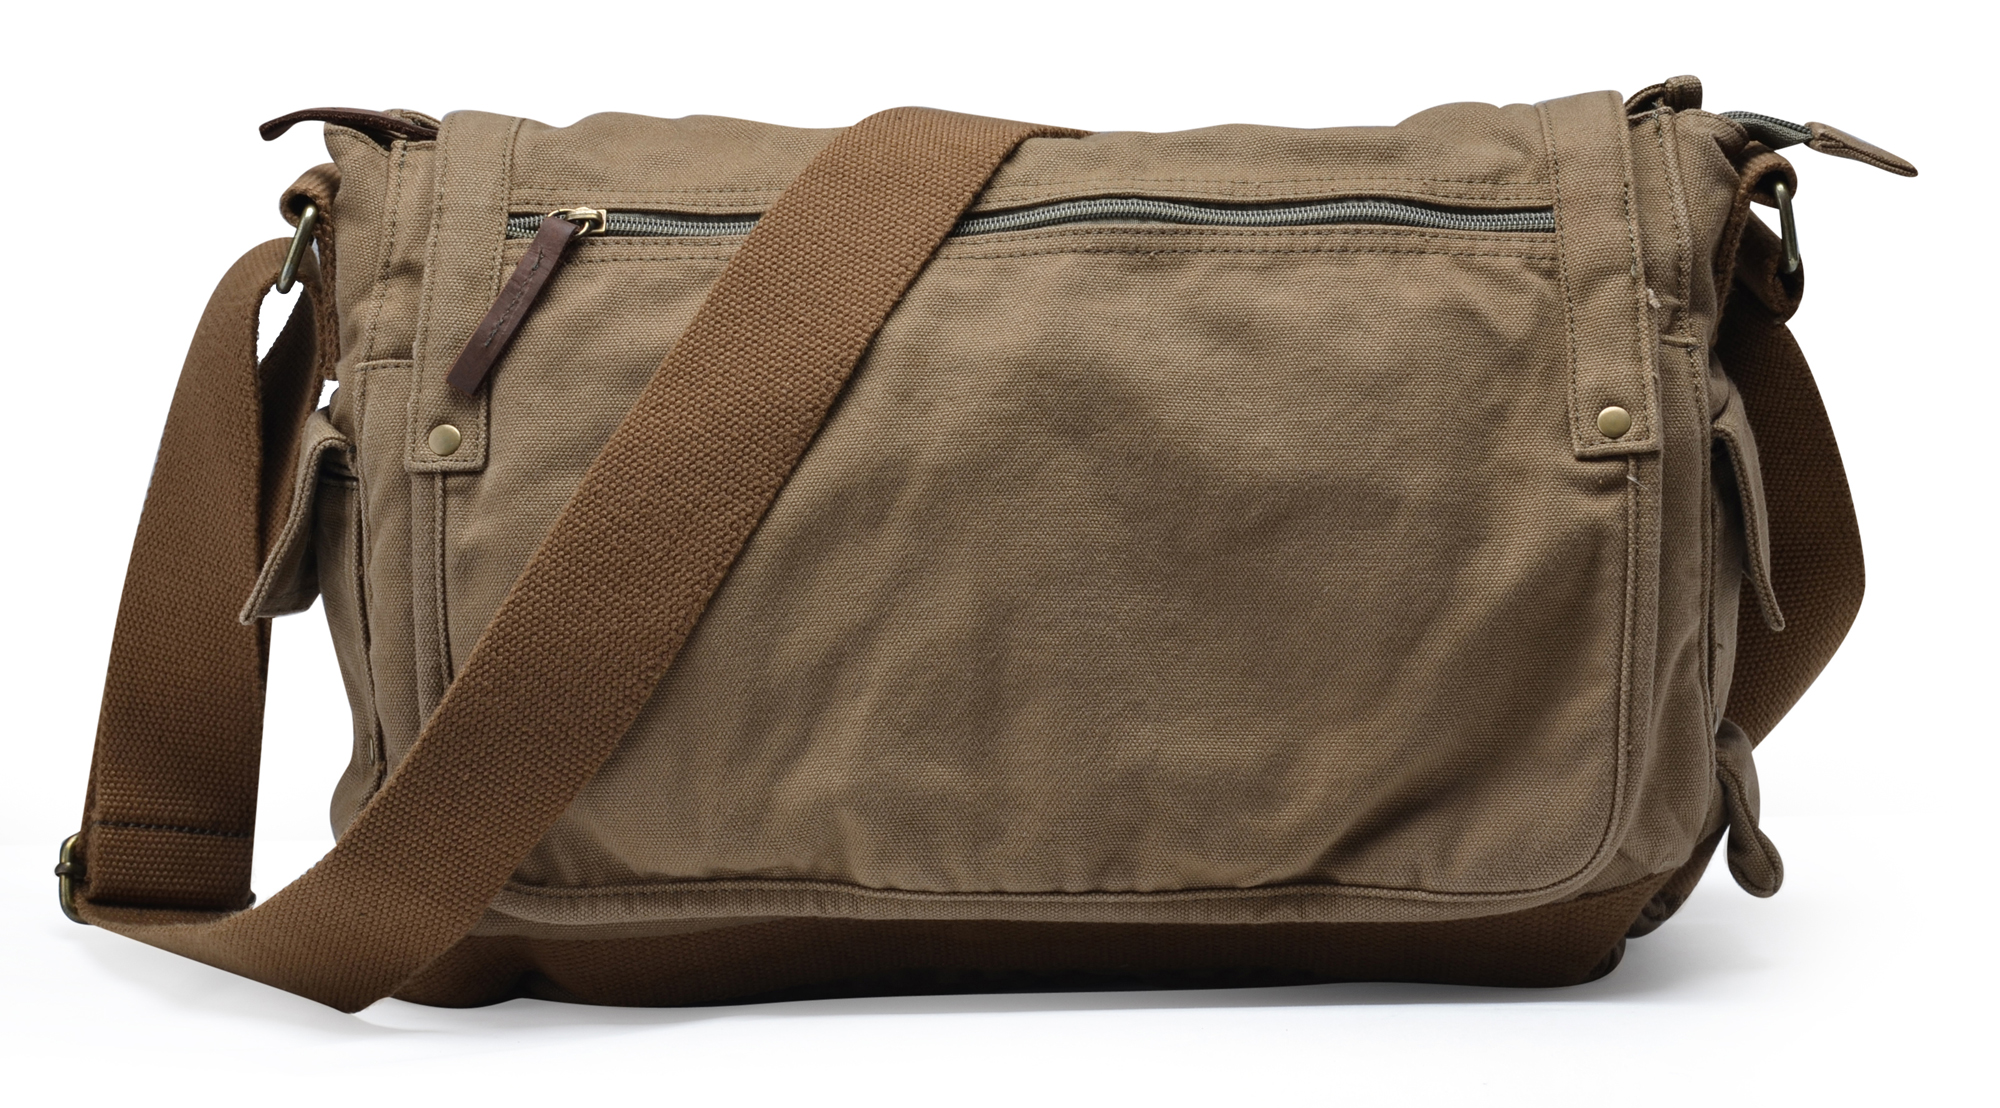 Gootium Casual Sturdy Canvas Military Messenger Bag